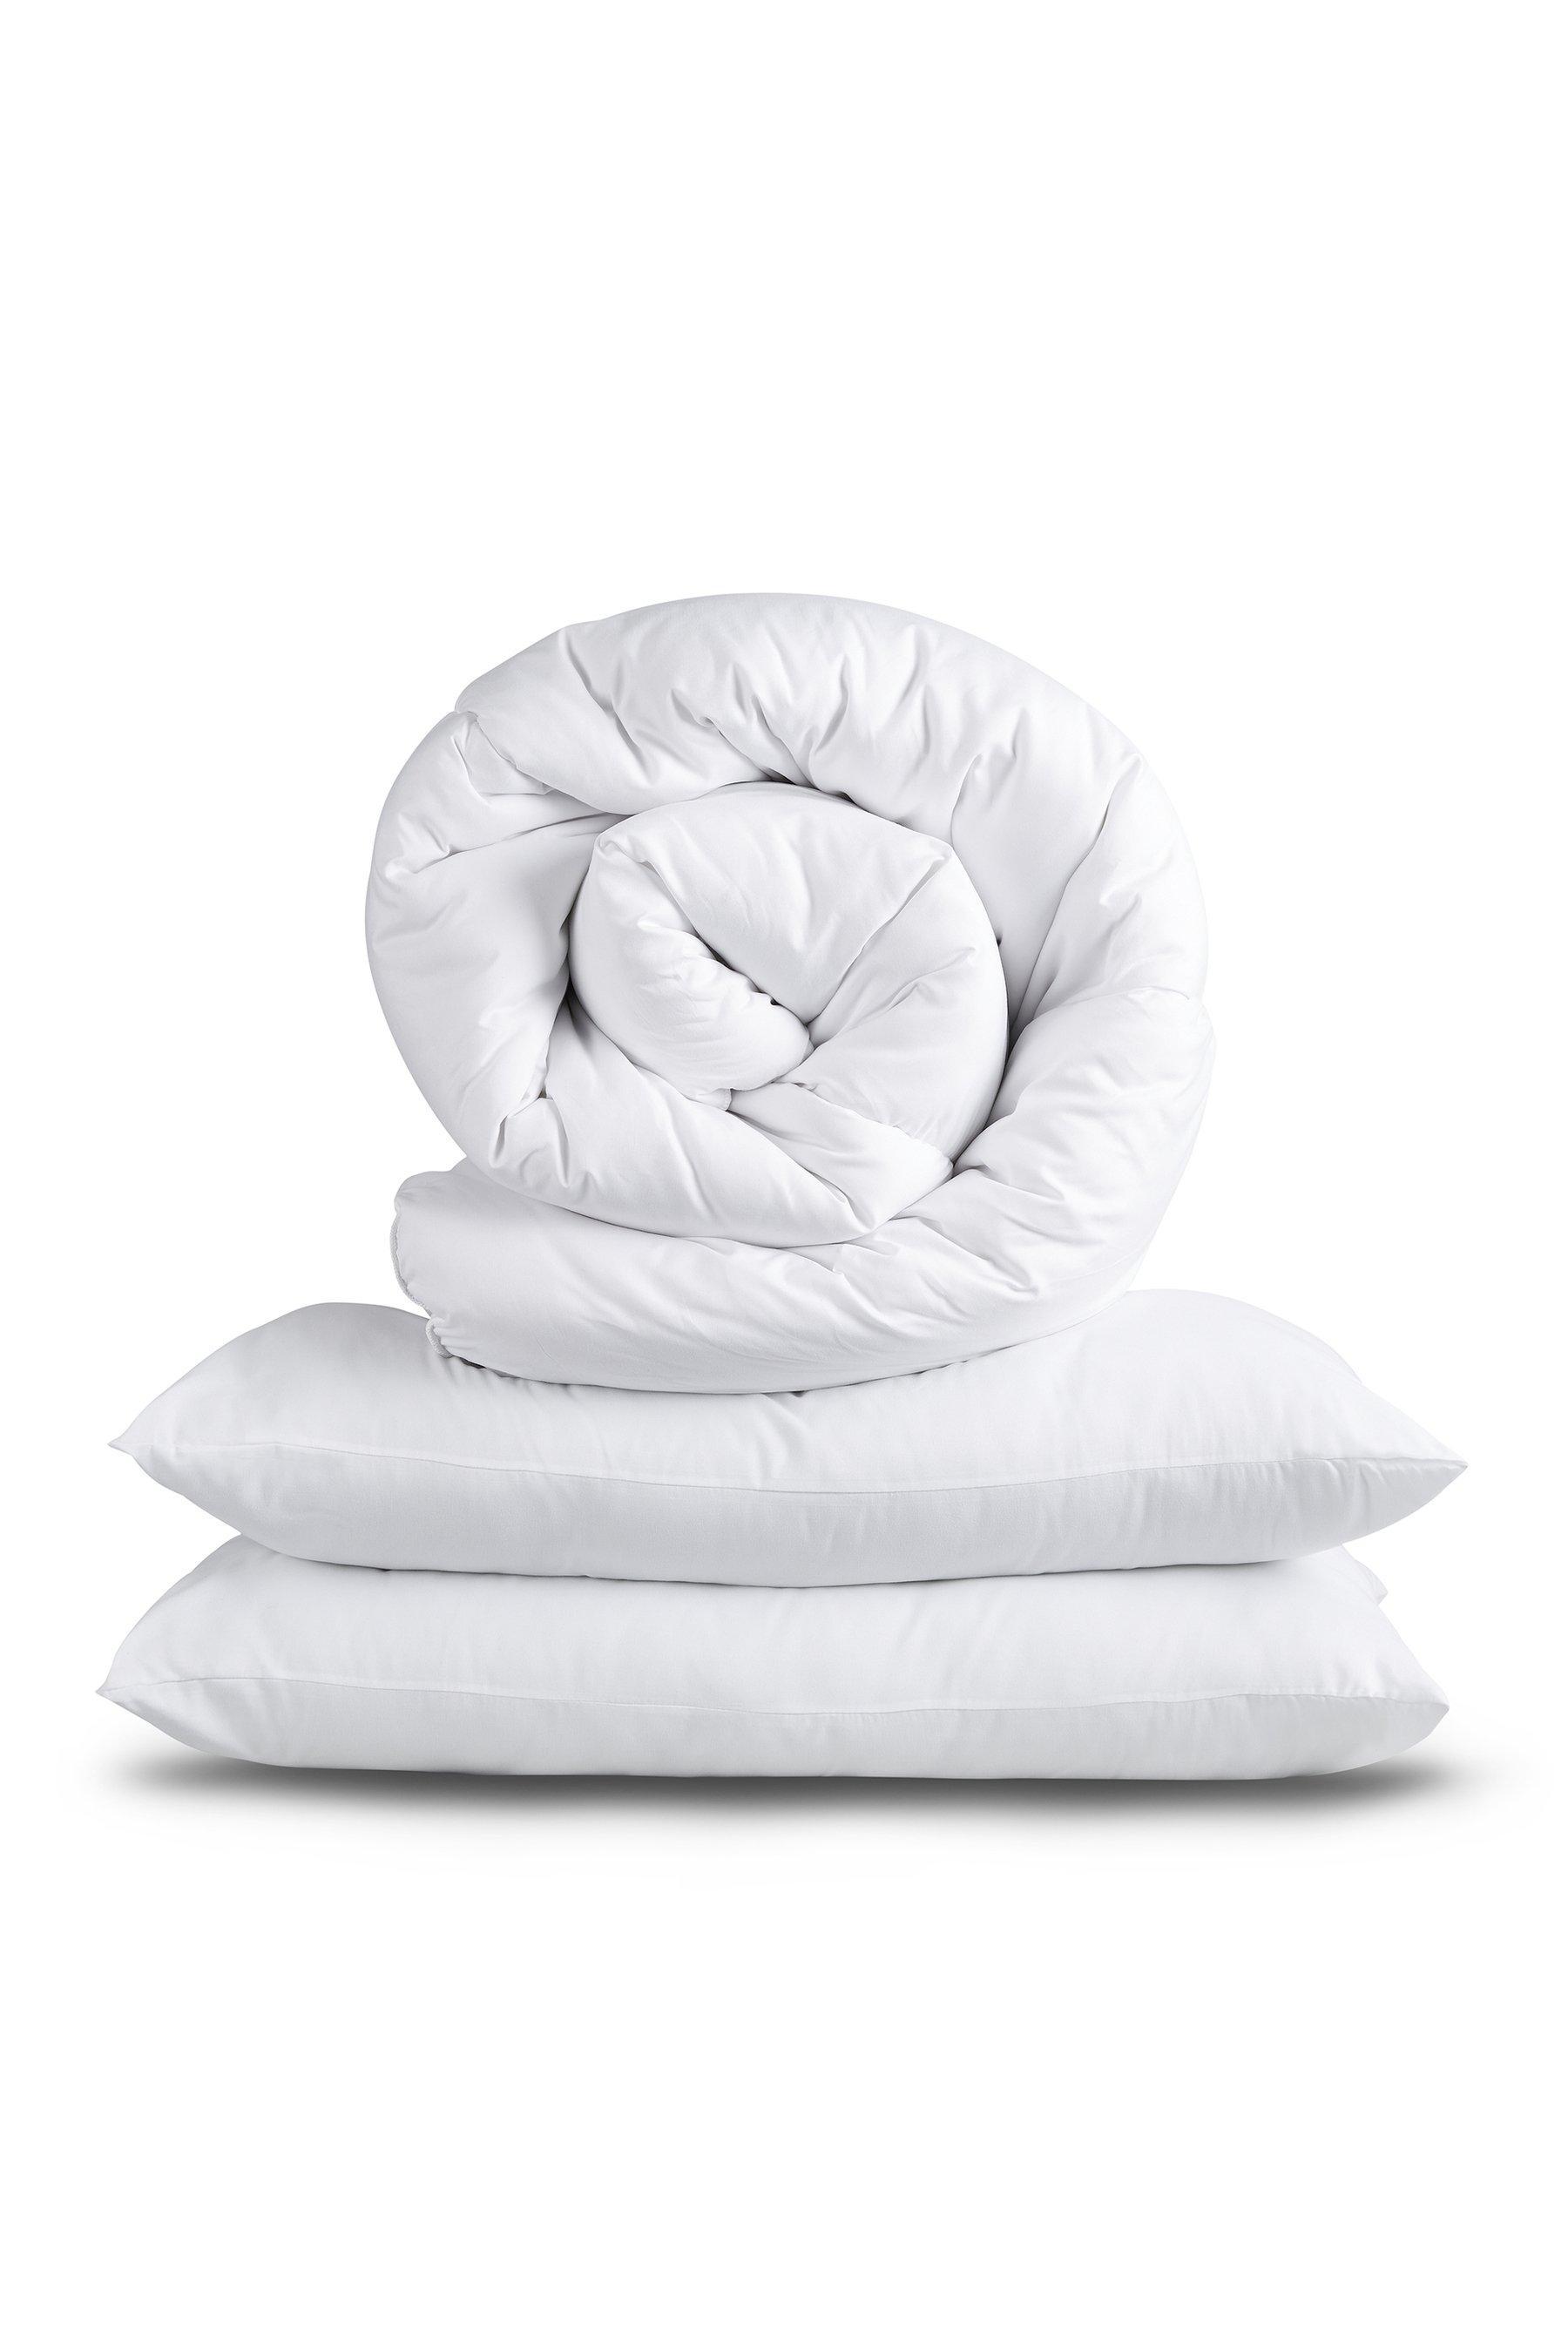 slumberdown climate control 10 5 tog duvet and 2 pillows